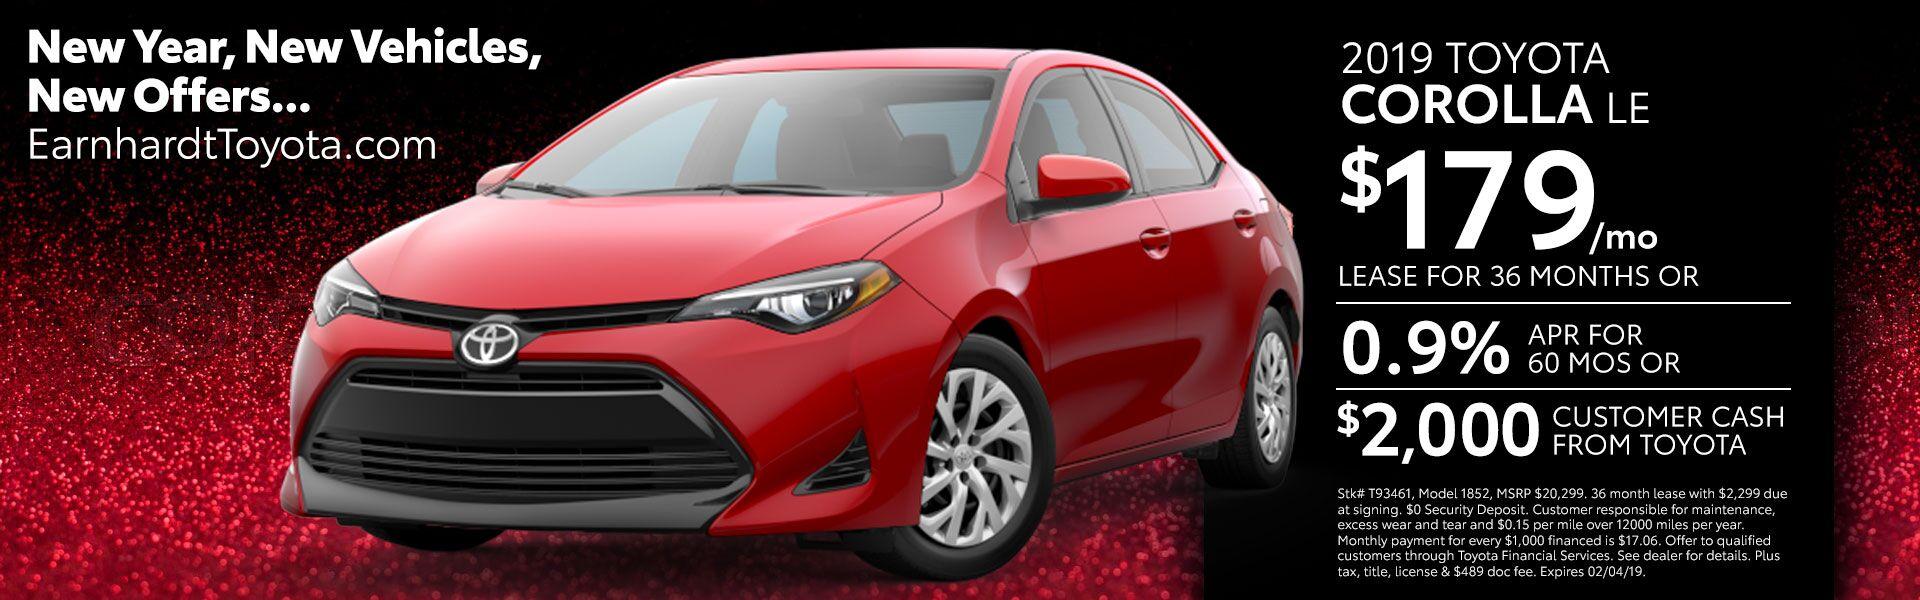 Earnhardt Hyundai Scottsdale >> Earnhardt Toyota Dealer Mesa AZ Serving Phoenix, Scottsdale, Tempe, Mesa, Chandler and Gilbert ...